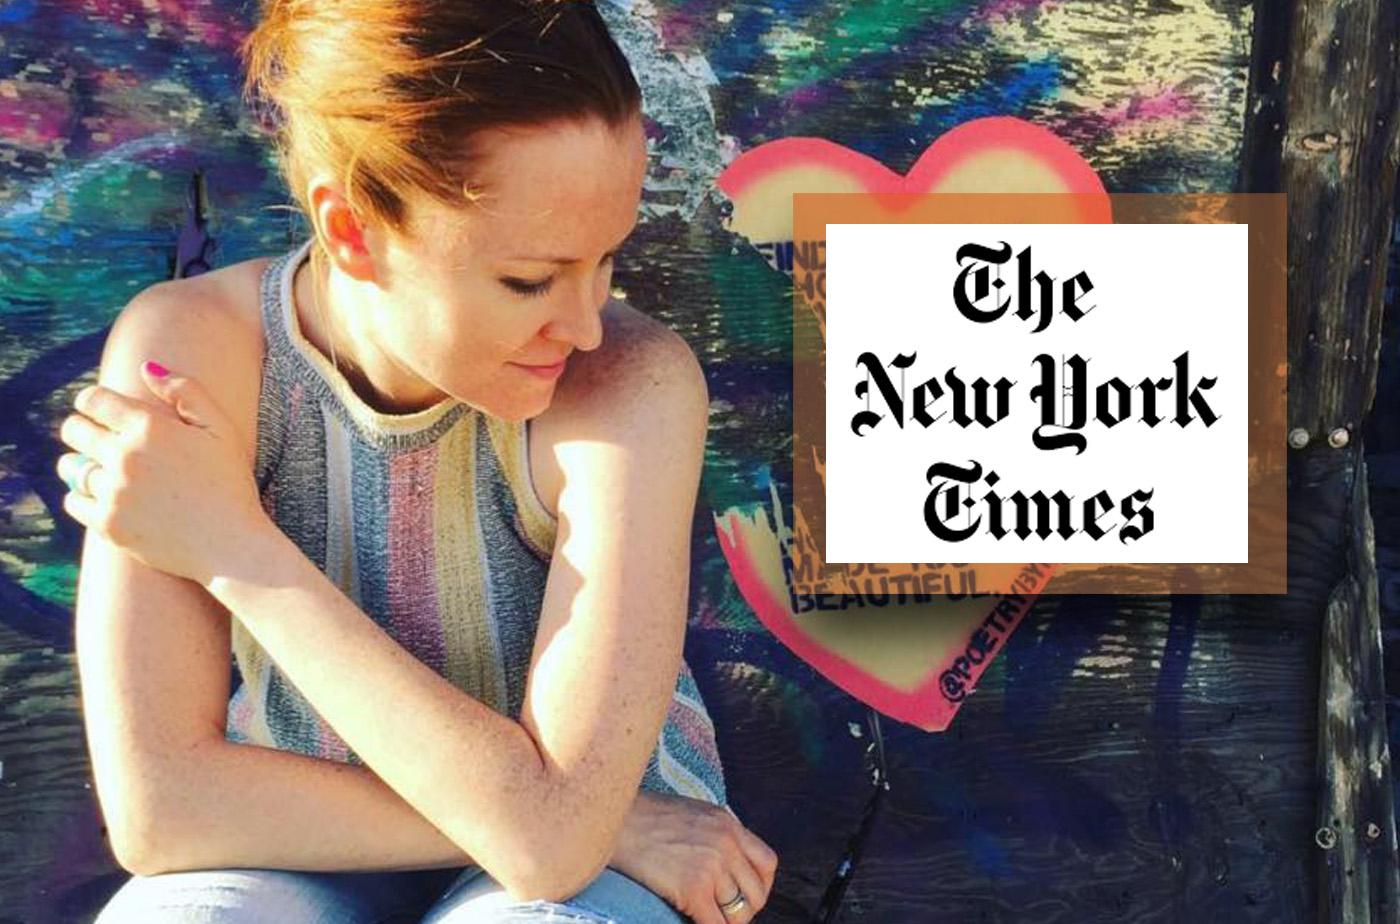 Catapult online classes: Sarah Herrington, 4-Week Online Nonfiction Workshop: Writing the New York Times Essay, Nonfiction, Workshop